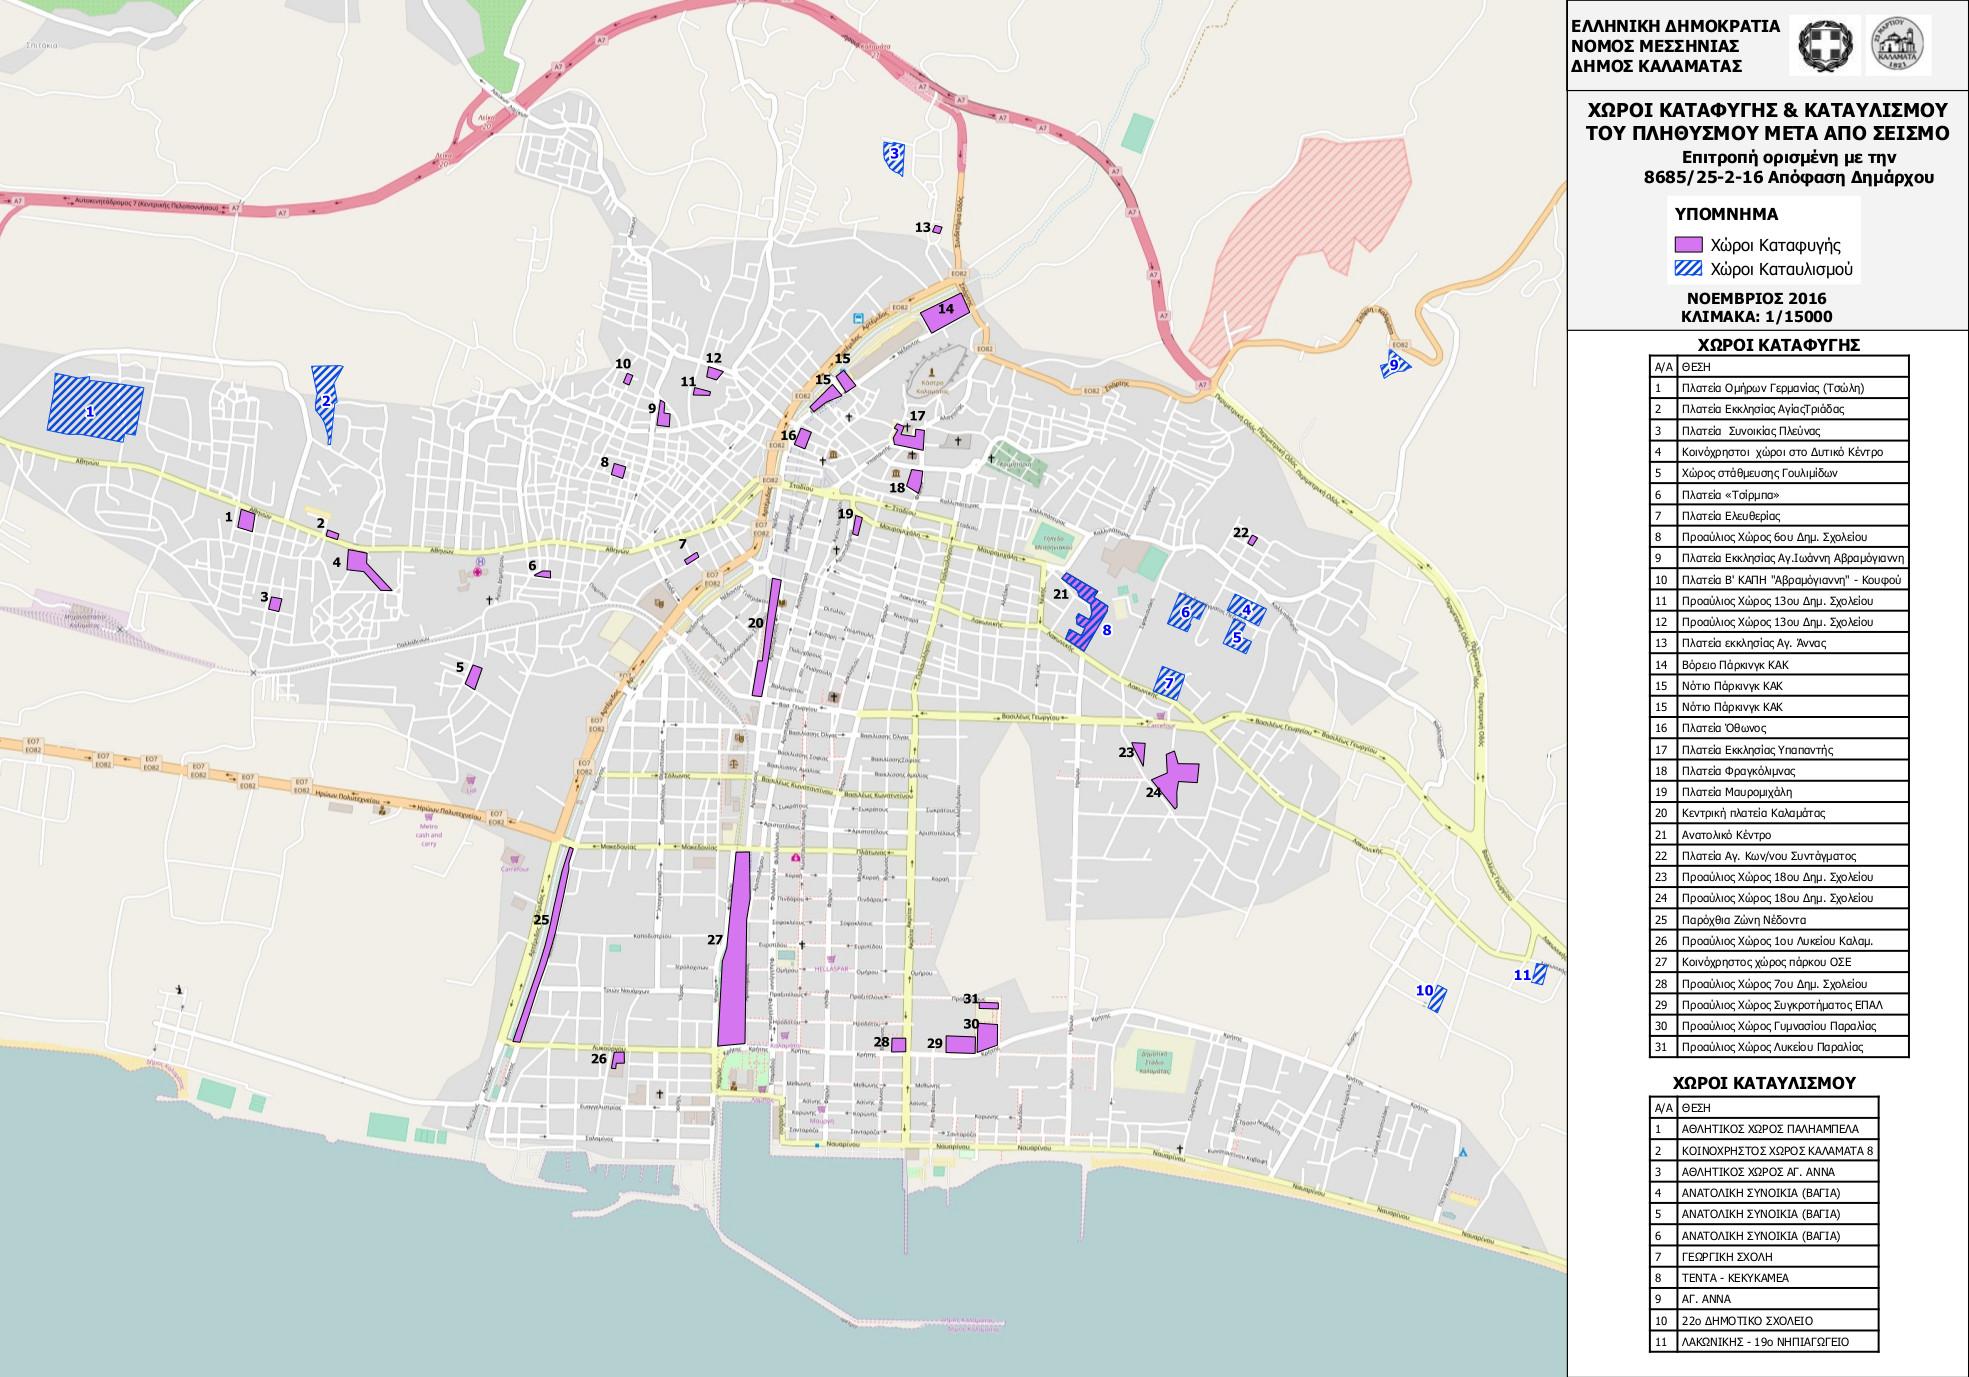 Aυτές είναι οι 10 προτάσεις του Δήμου Καλαμάτας για την Πολιτική Προστασία